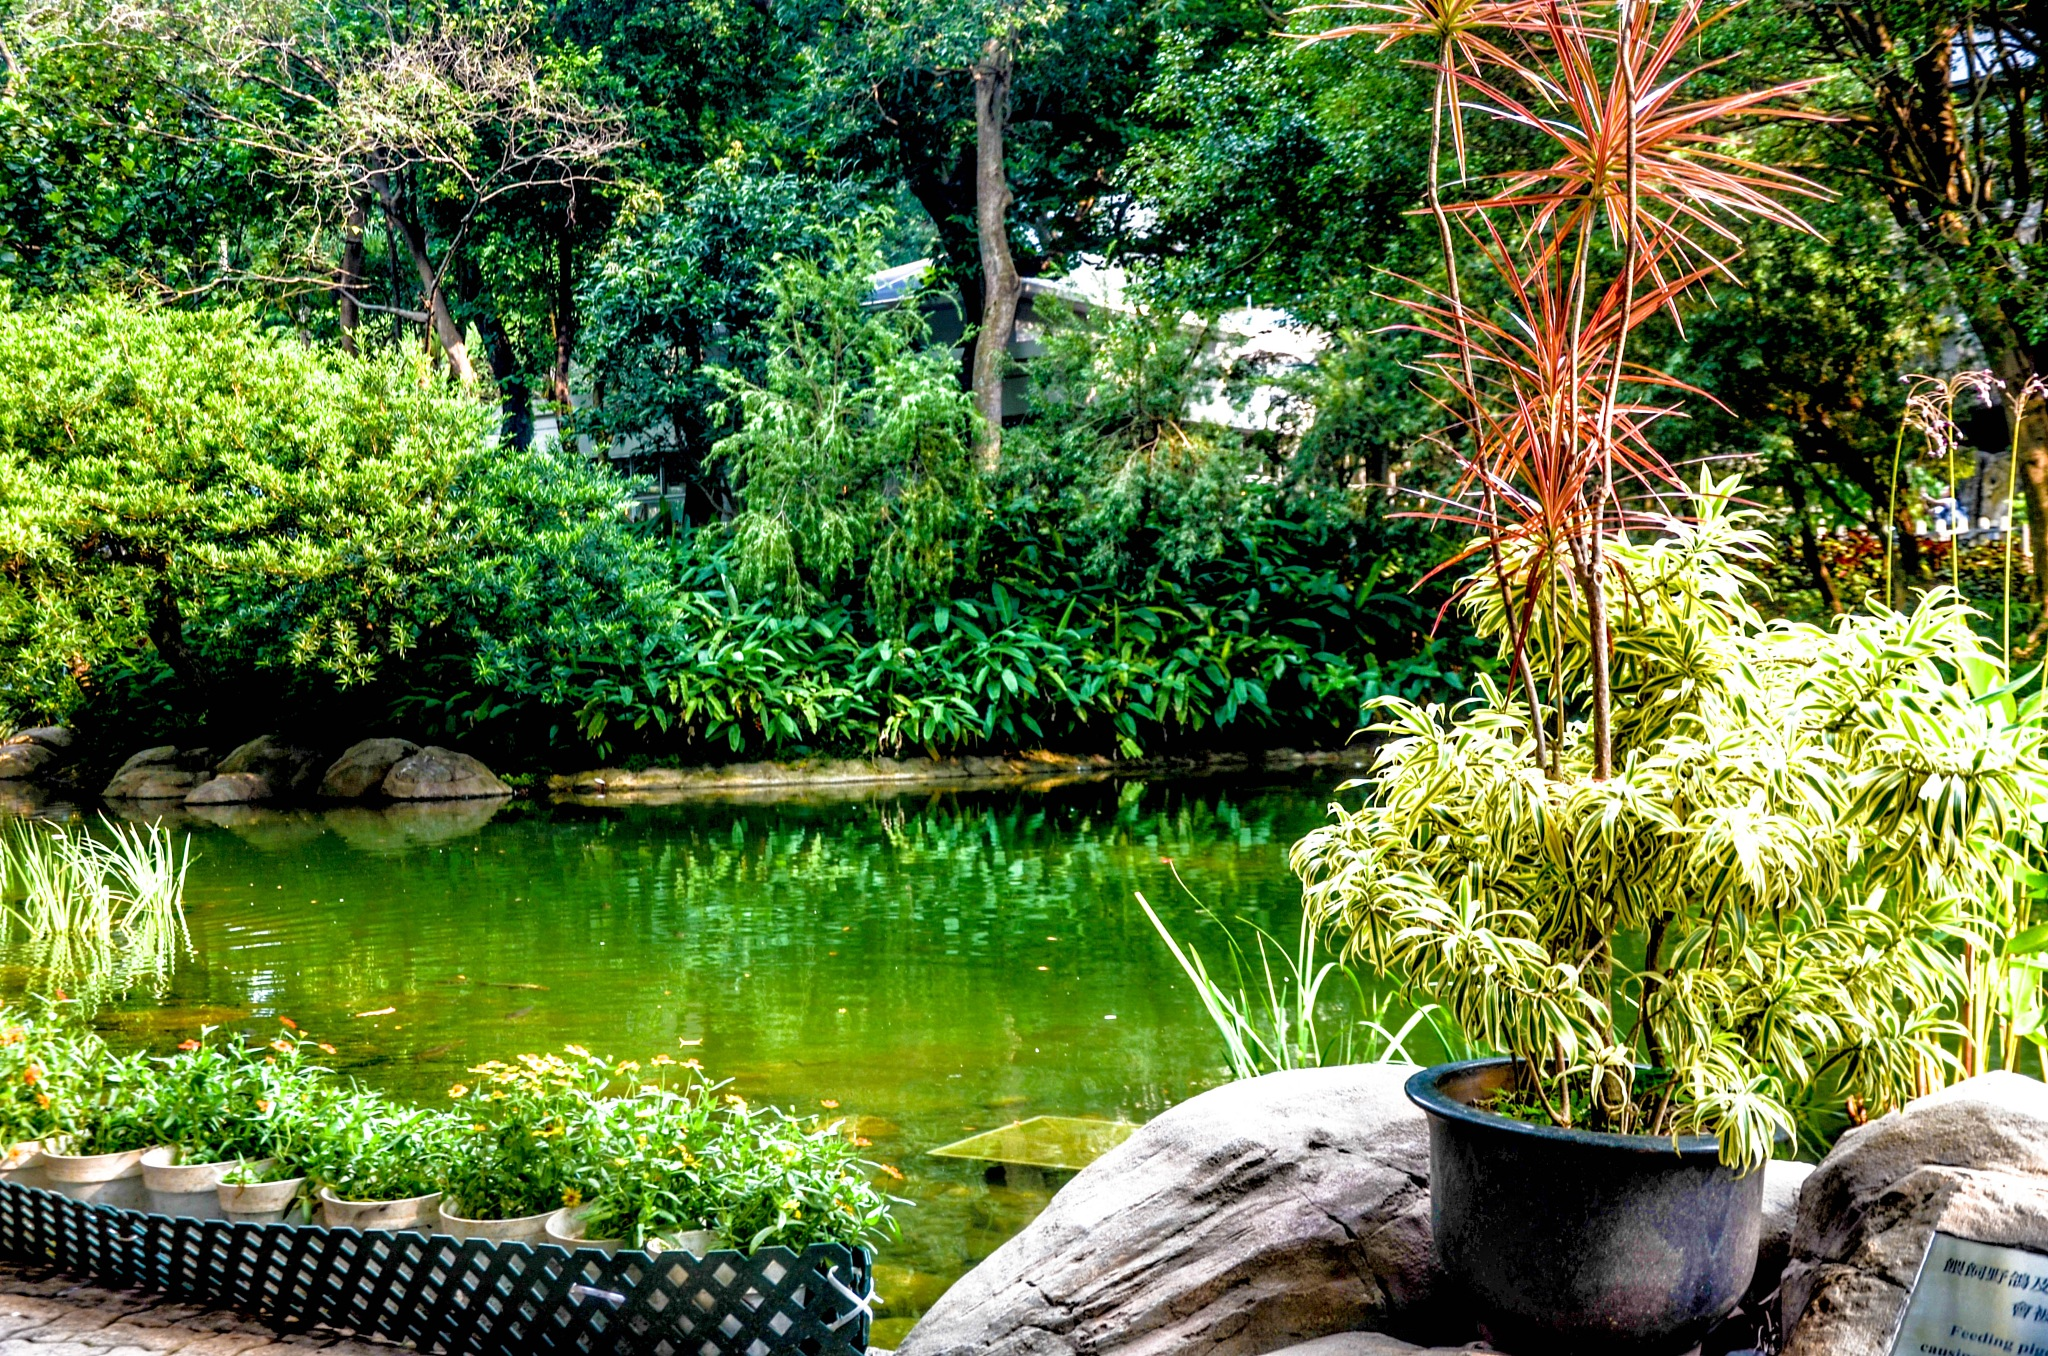 Park in Concrete Jungle! by Saurav Man Sainju